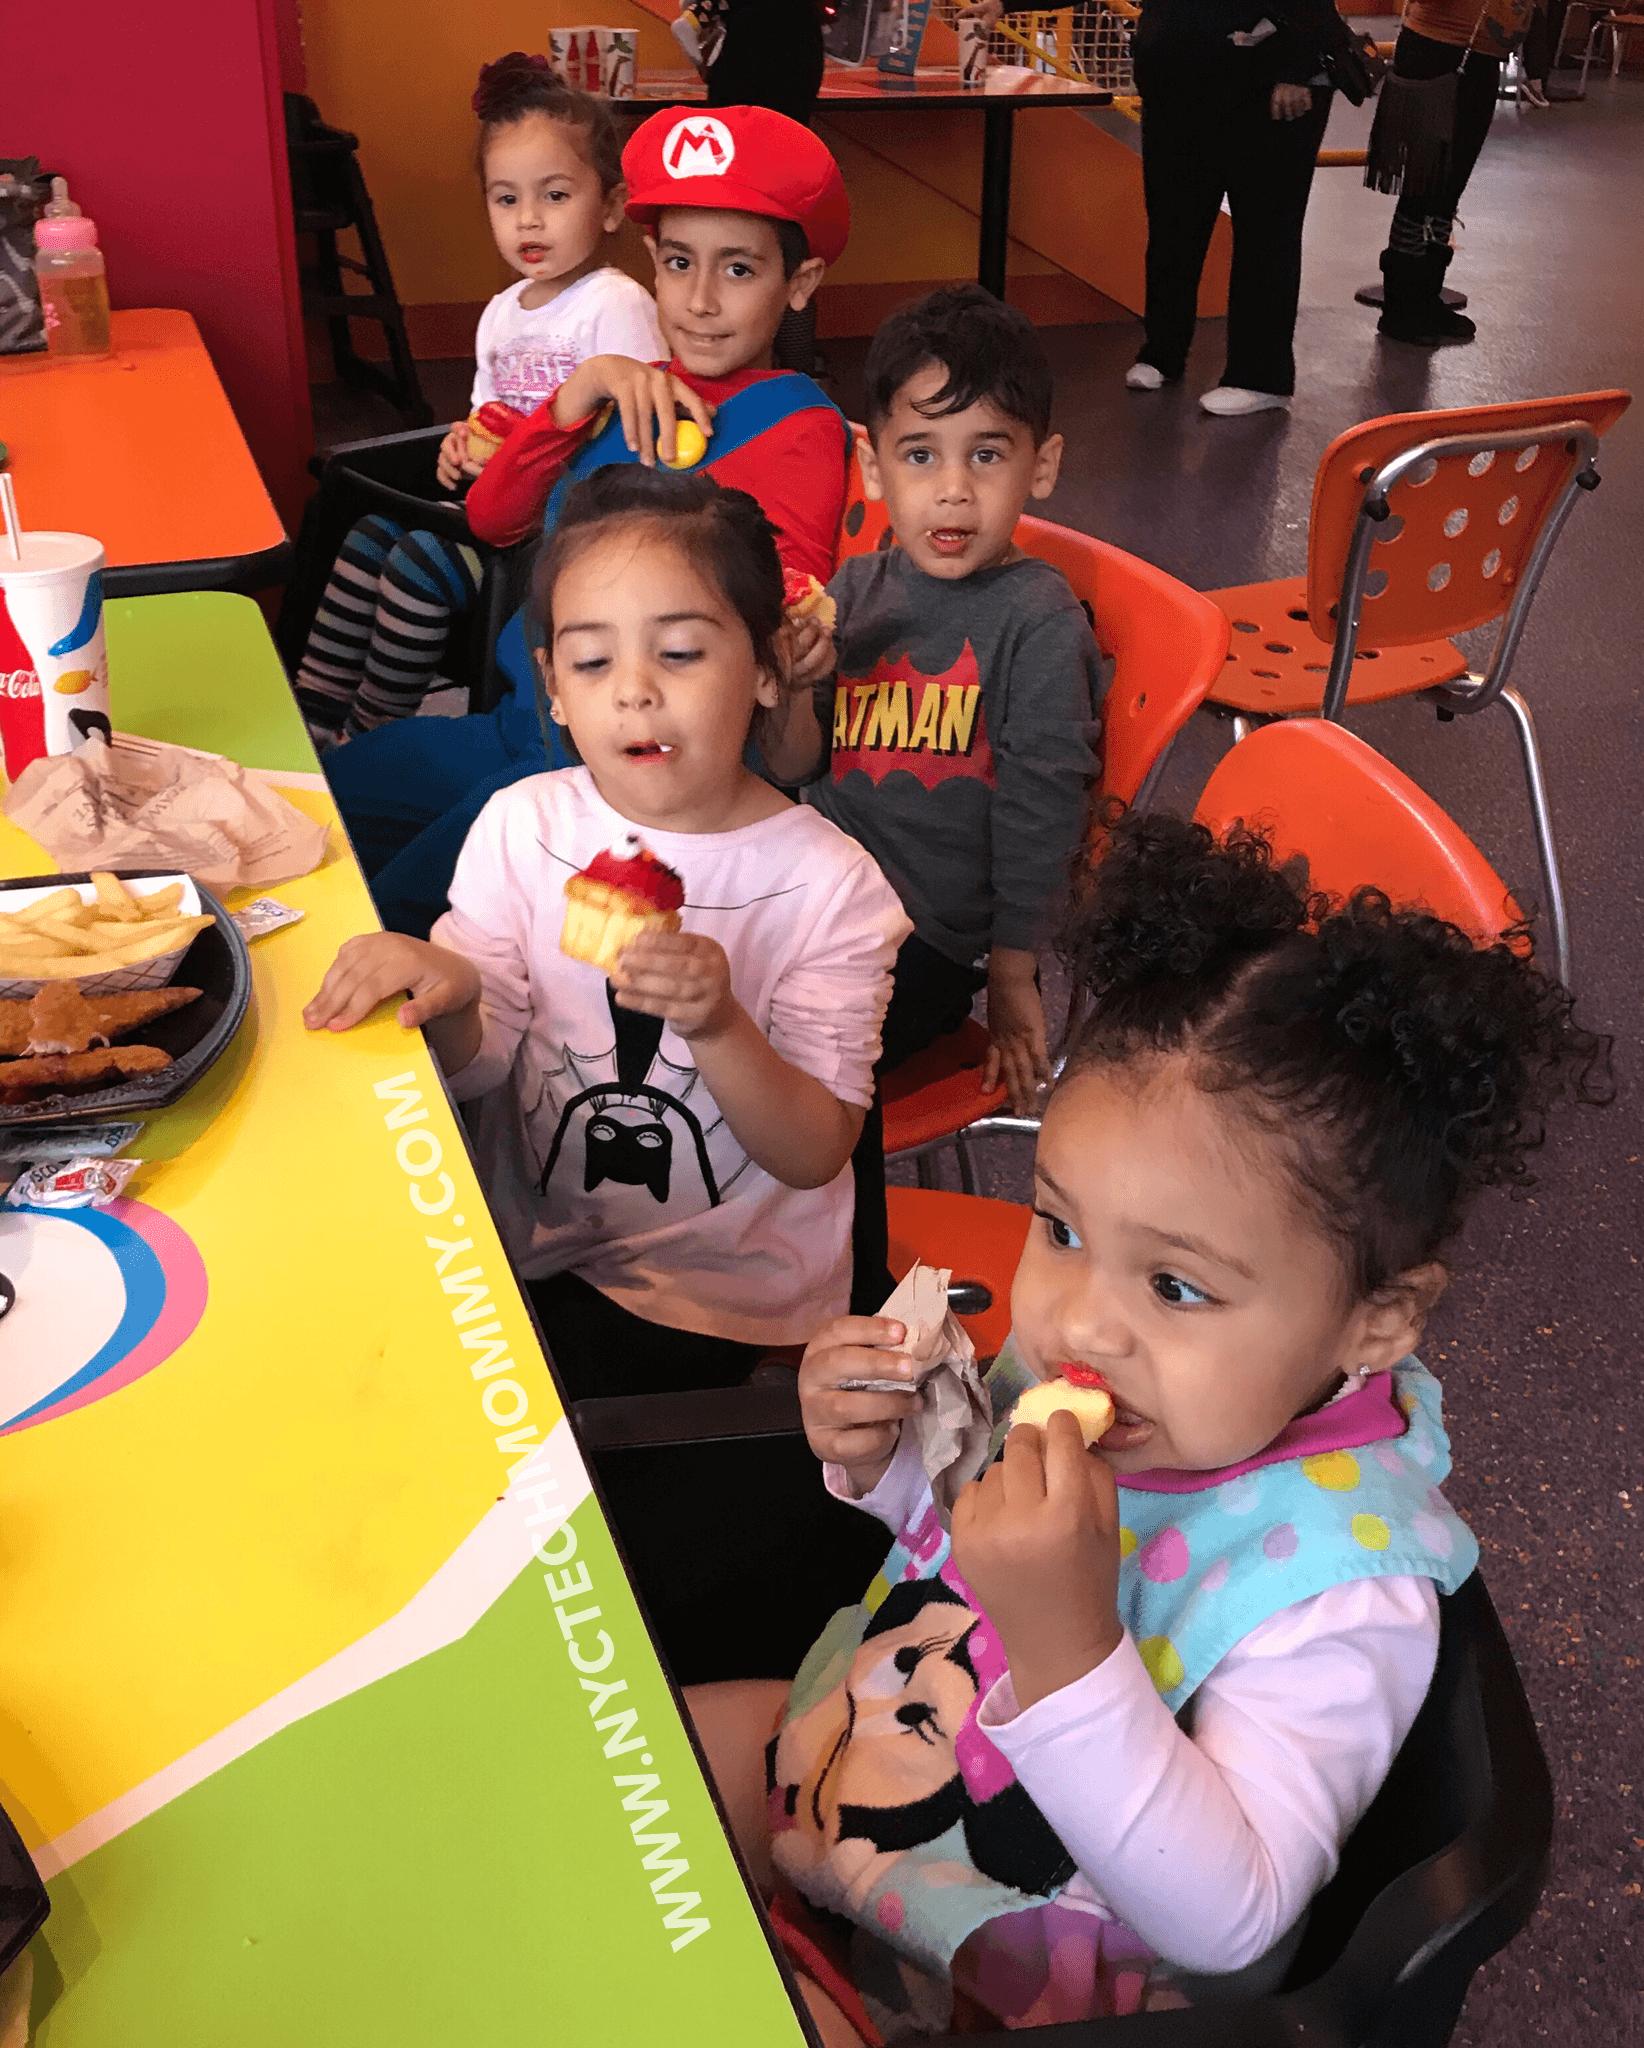 Eating Elmo cupcakes - Sesame Place